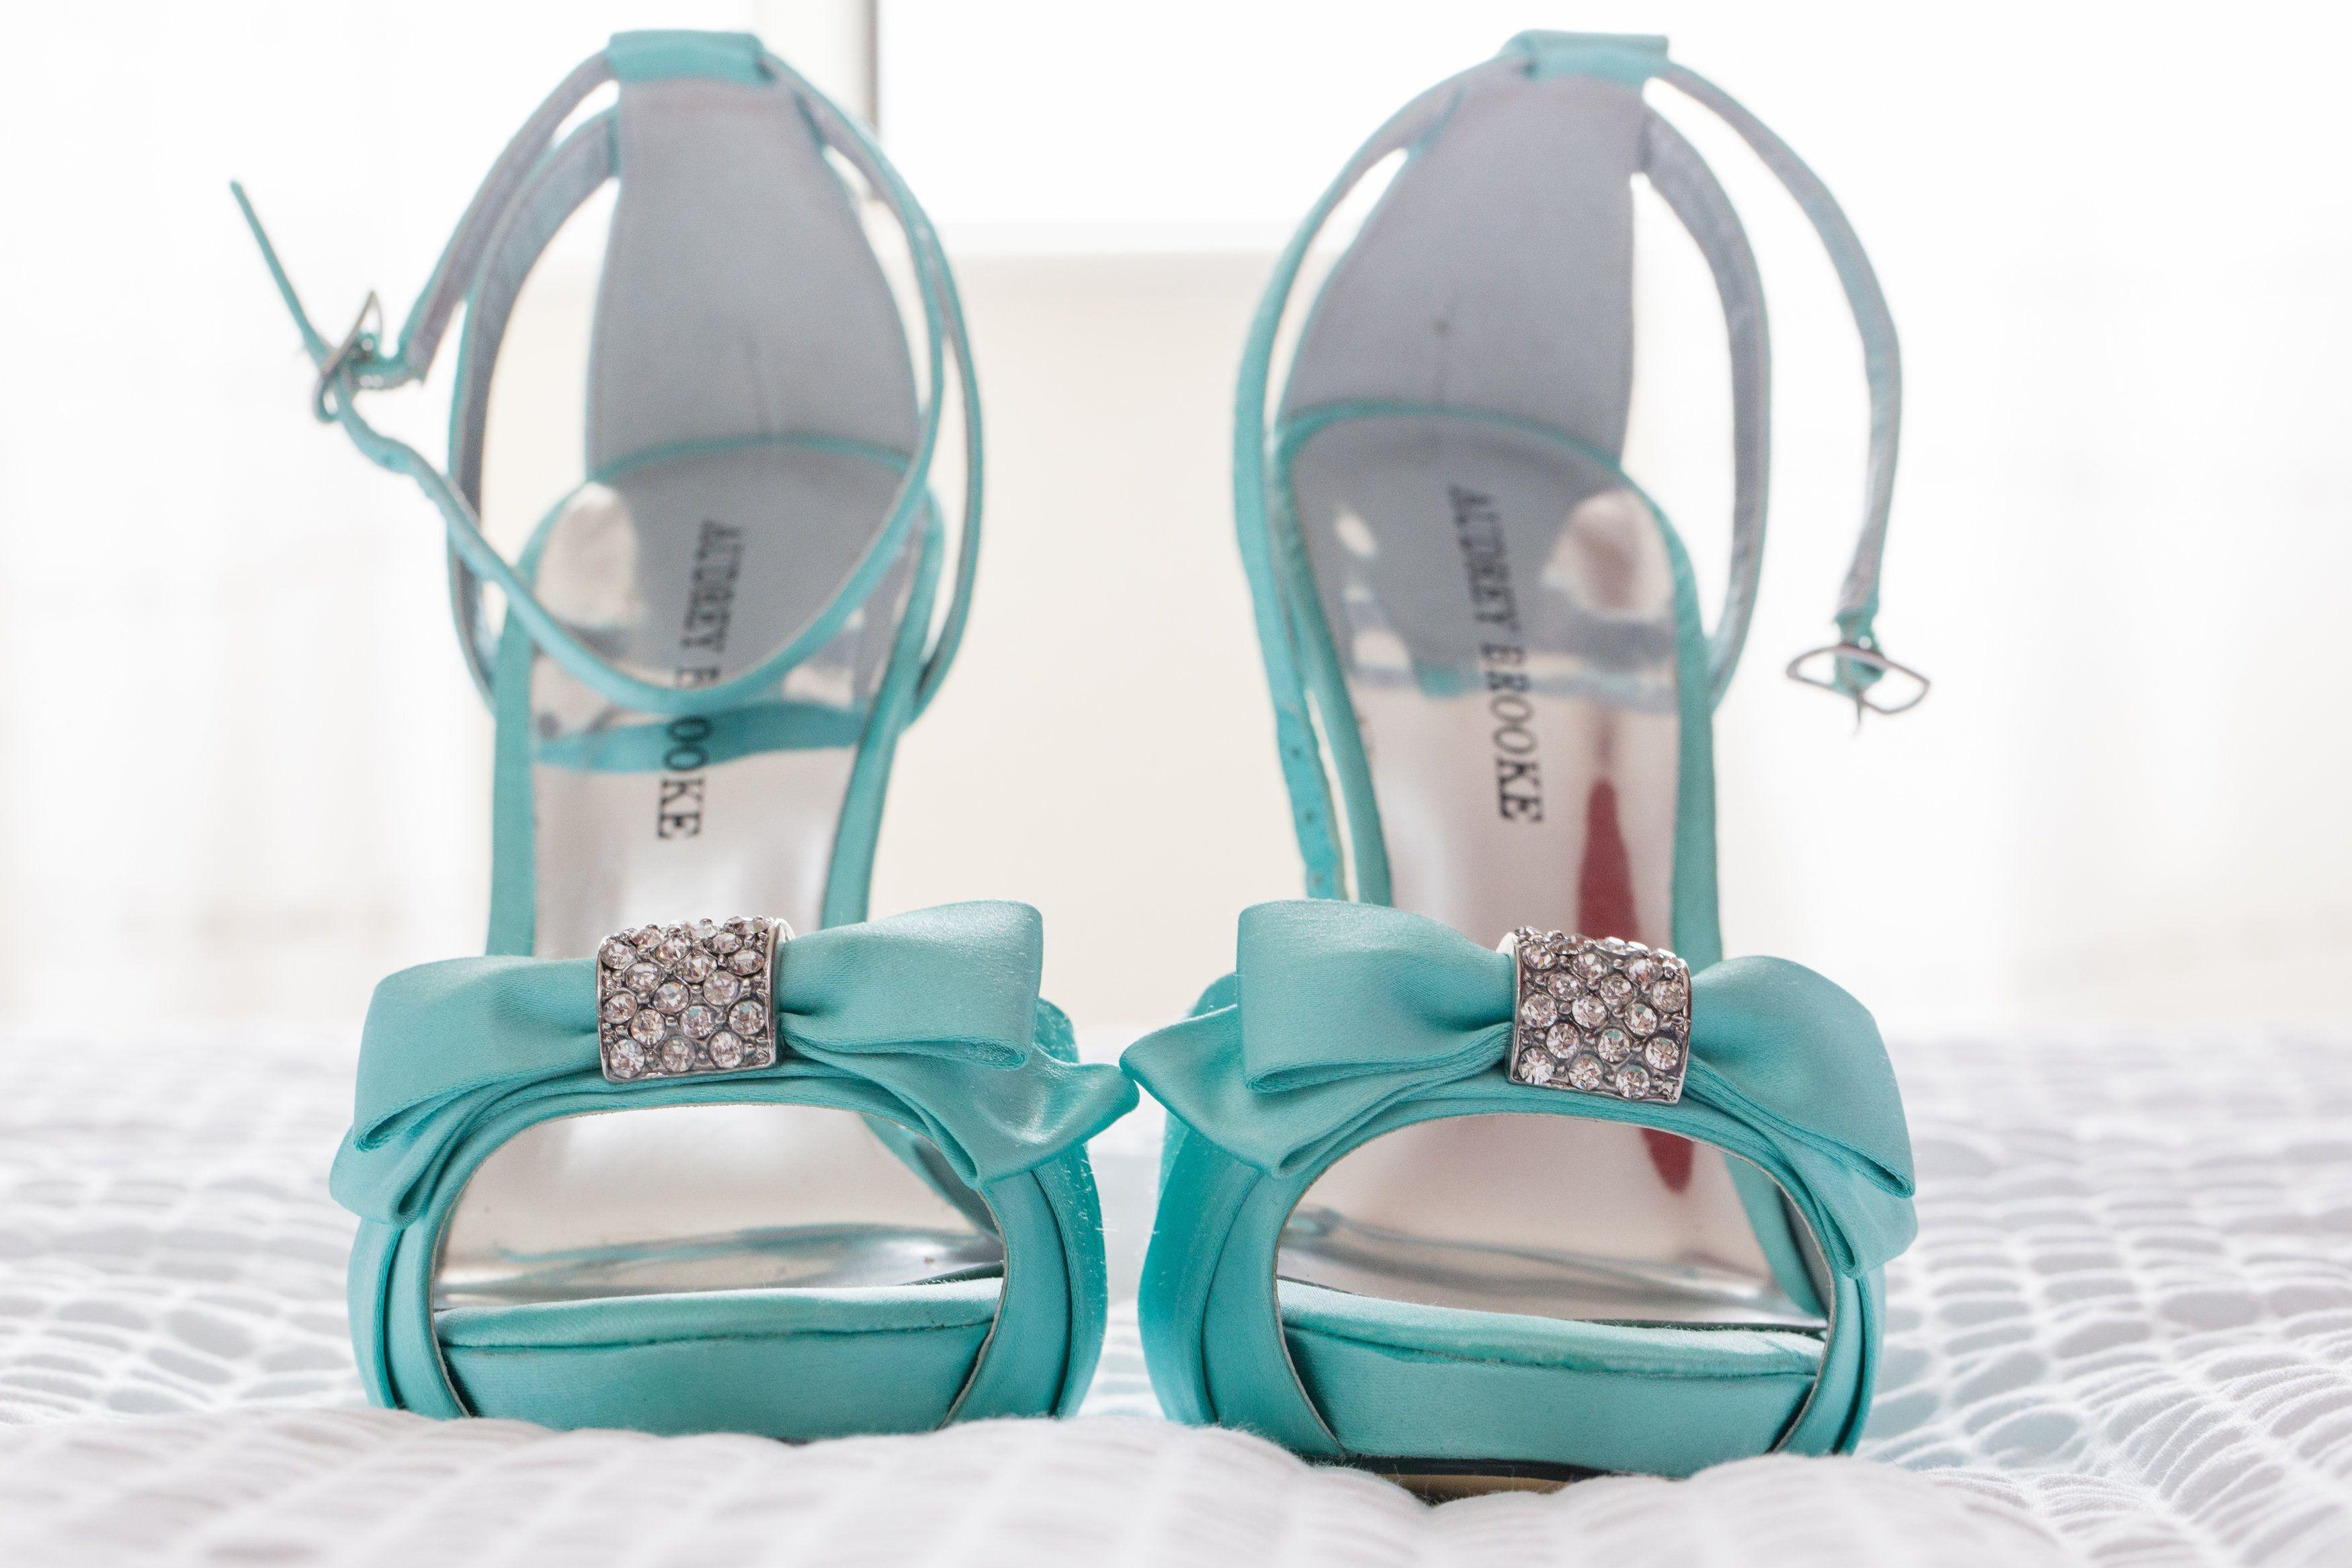 Pin By Rene Deman On My Tiffany Navy Blue Wedding Blue Wedding Shoes Tiffany Blue Wedding Shoes Tiffany Blue Wedding